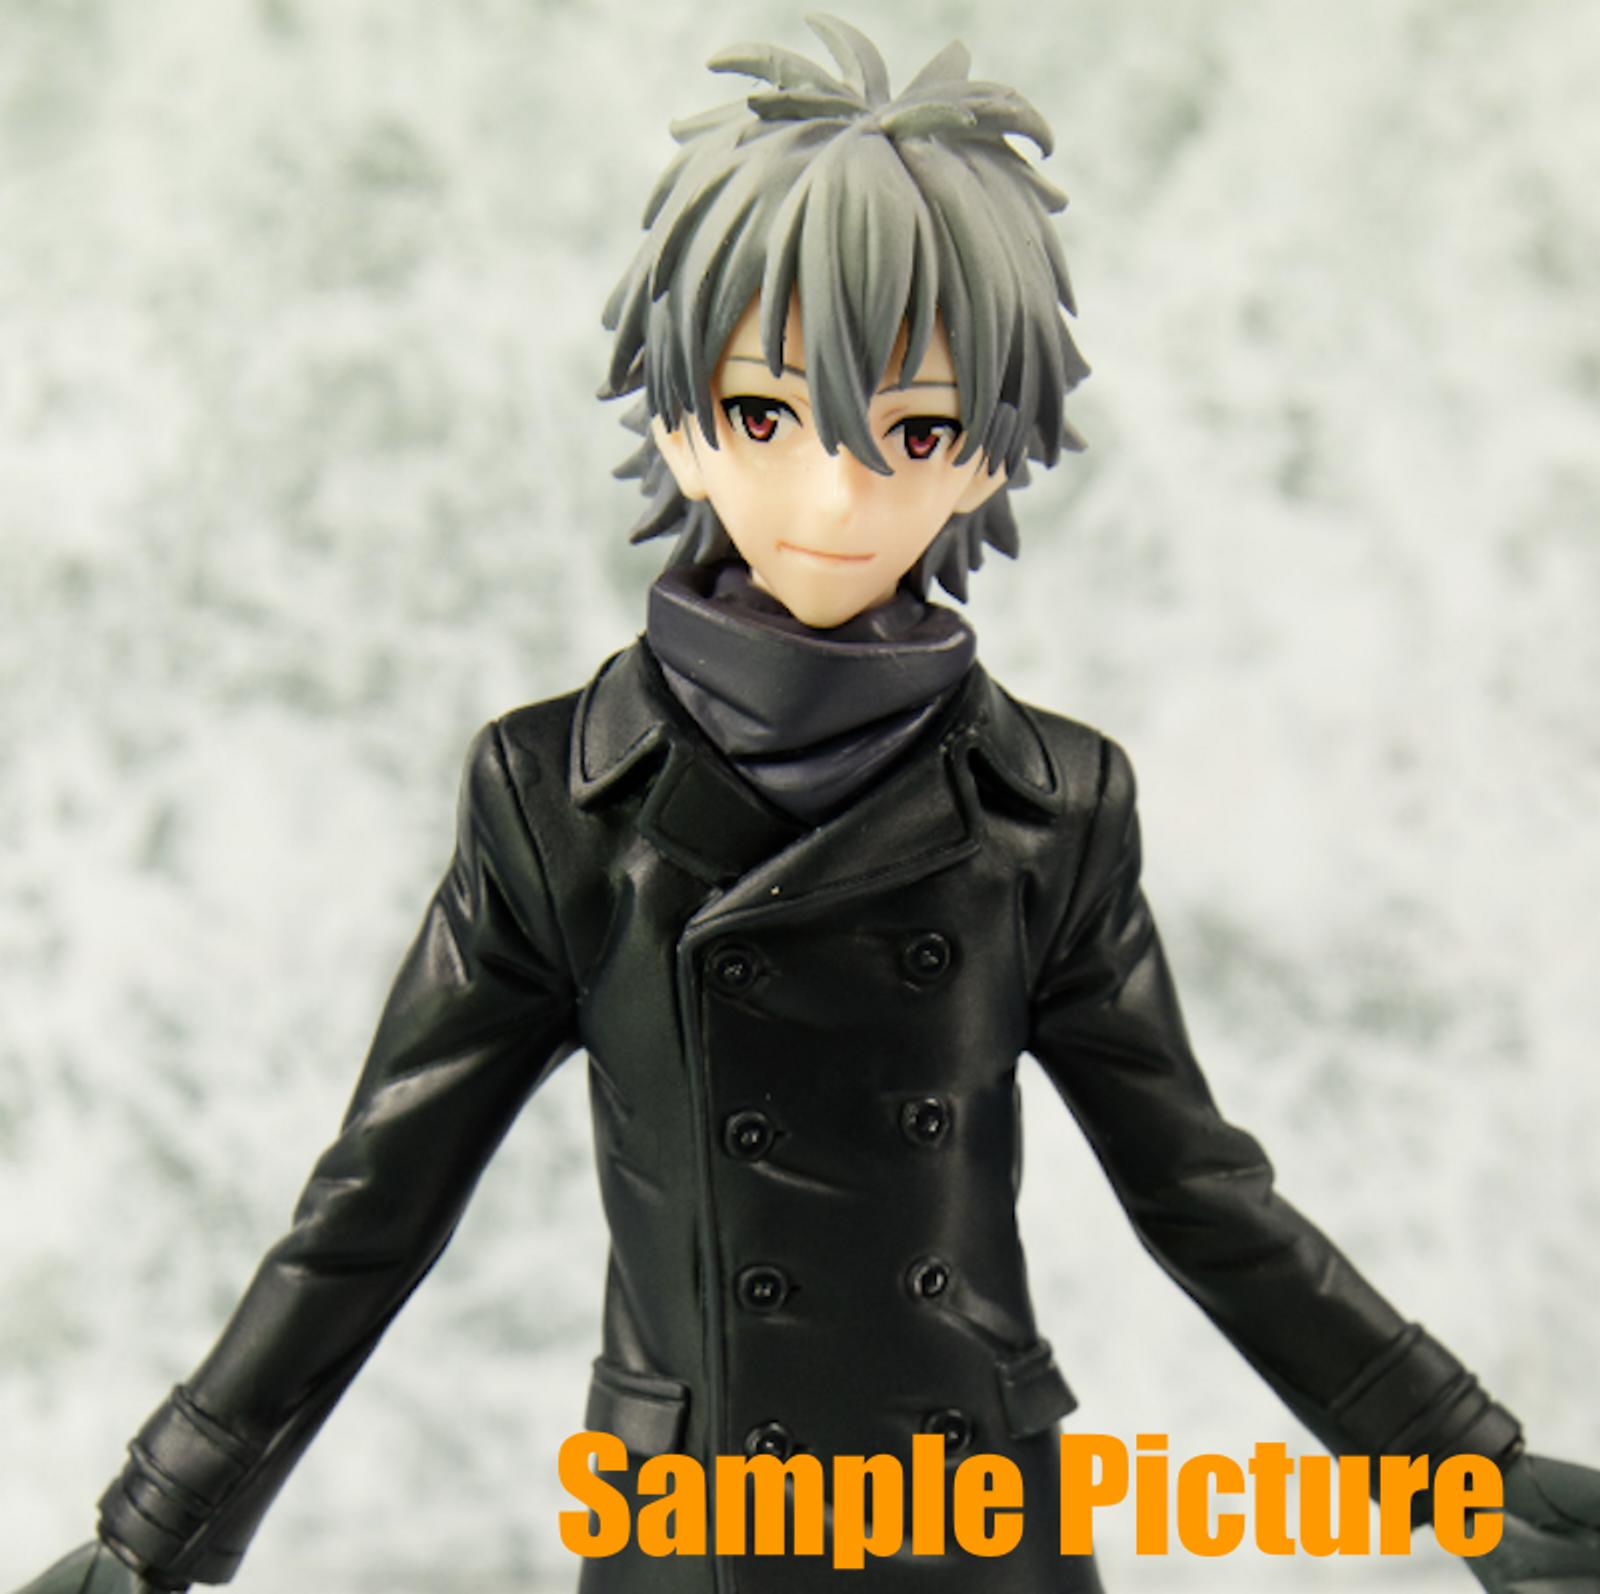 Evangelion Nagisa Kaworu Black Coat Premium Figure SEGA JAPAN ANIME